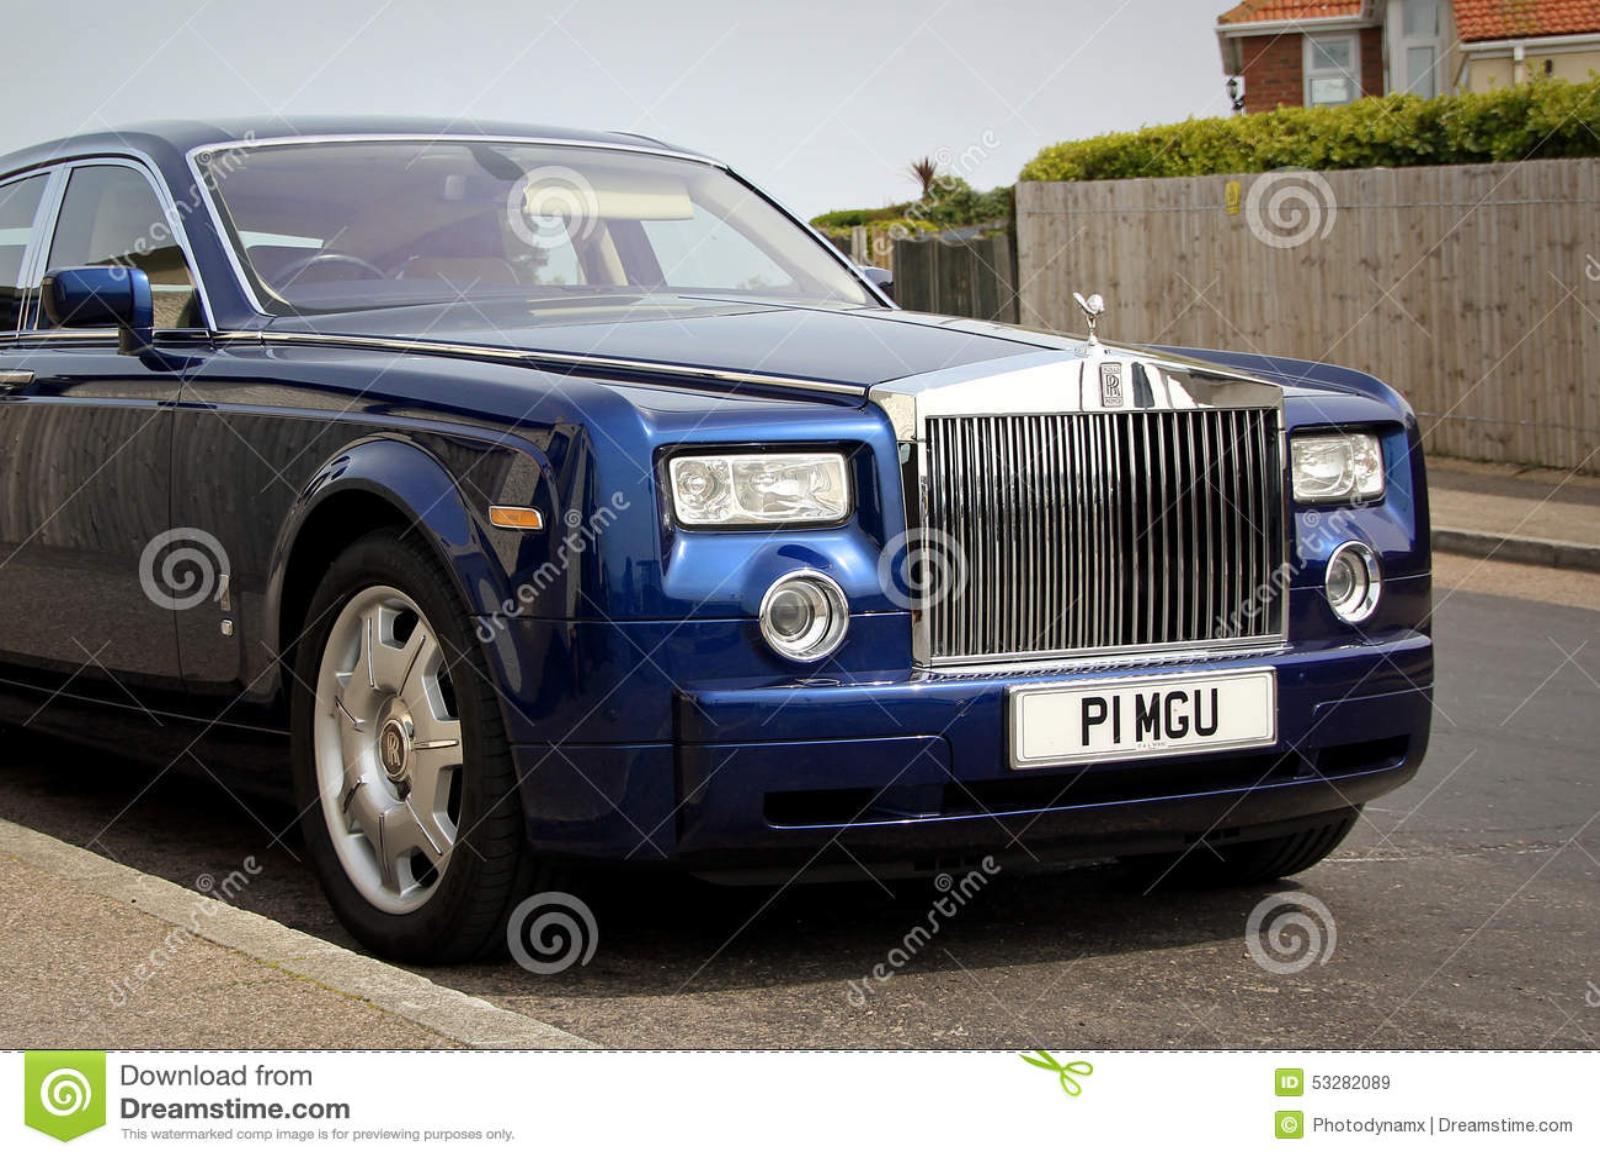 Luxury Rolls Royce Editorial Stock Image Image Of Luxury 53282089